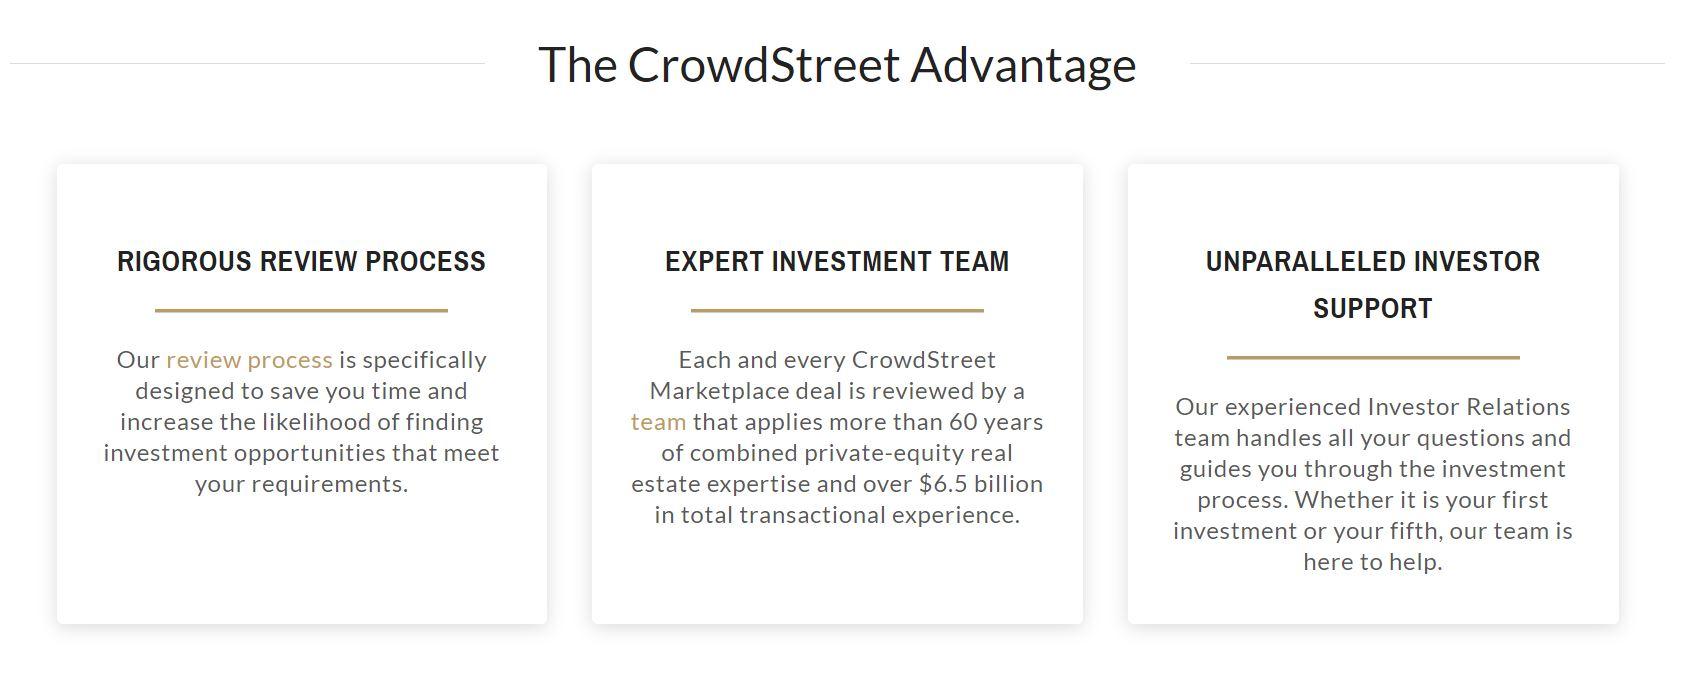 crowdstreet advantage